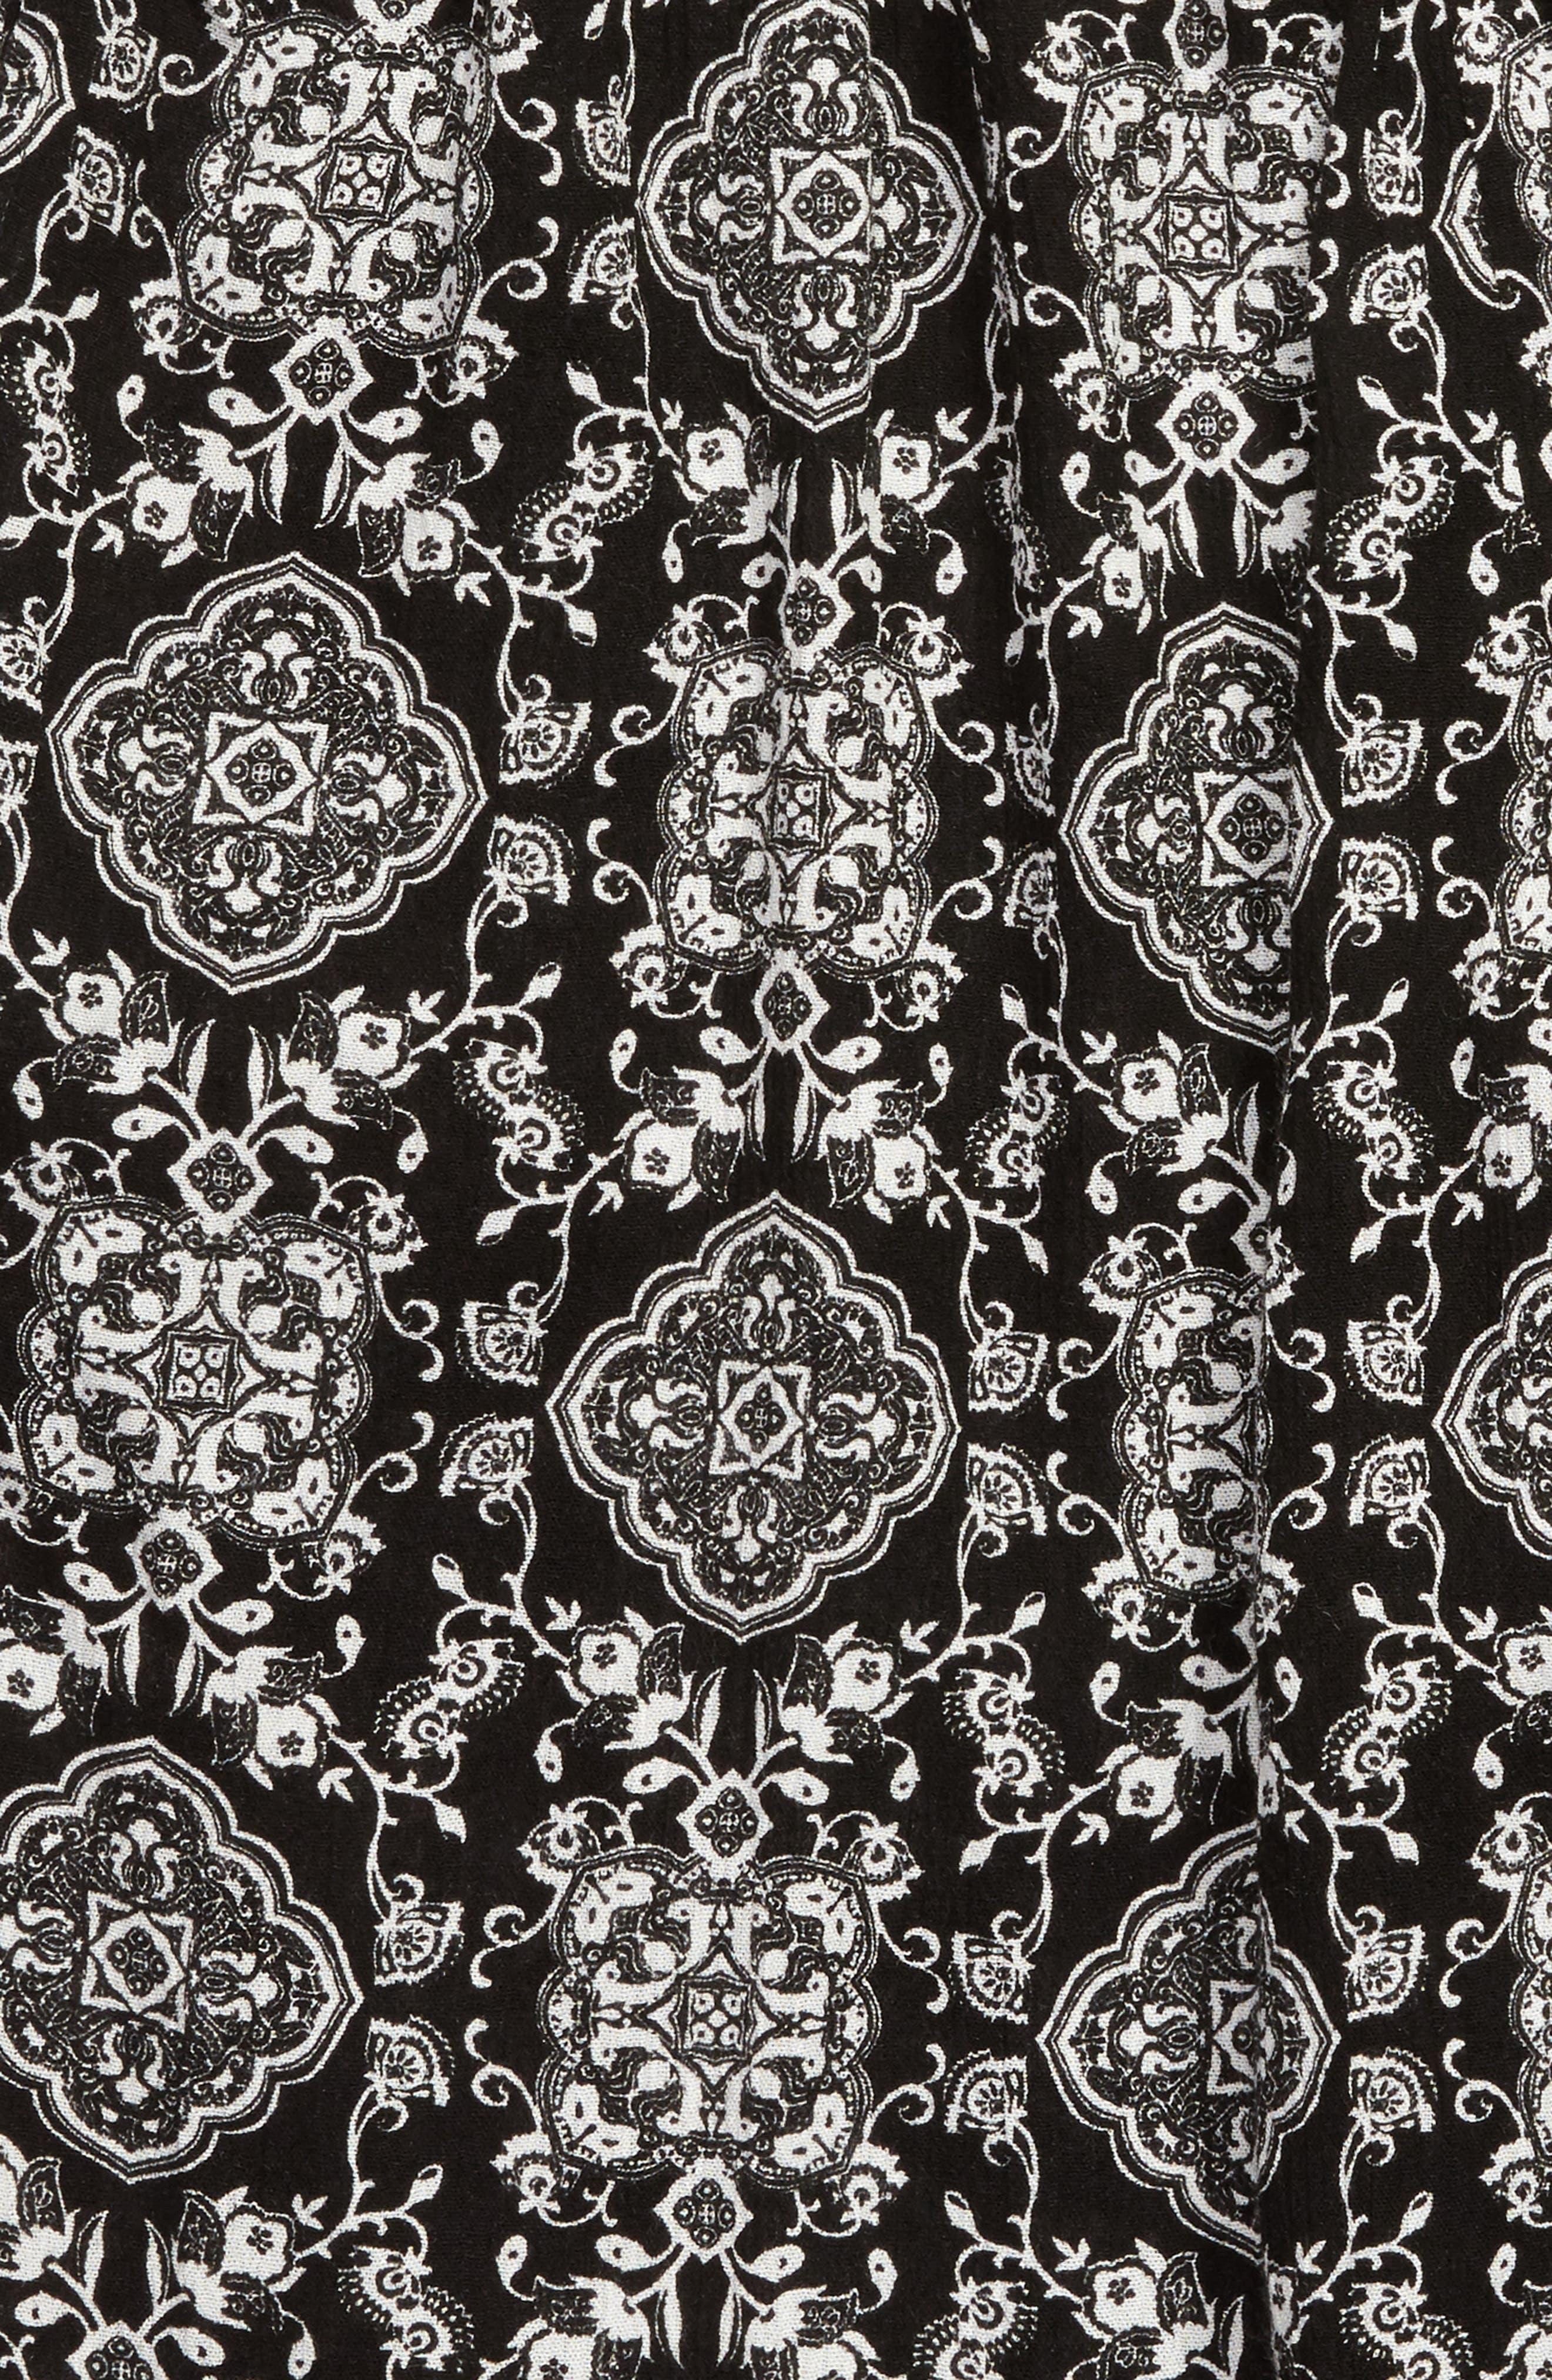 Smocked Jumpsuit,                             Alternate thumbnail 2, color,                             Black/ White